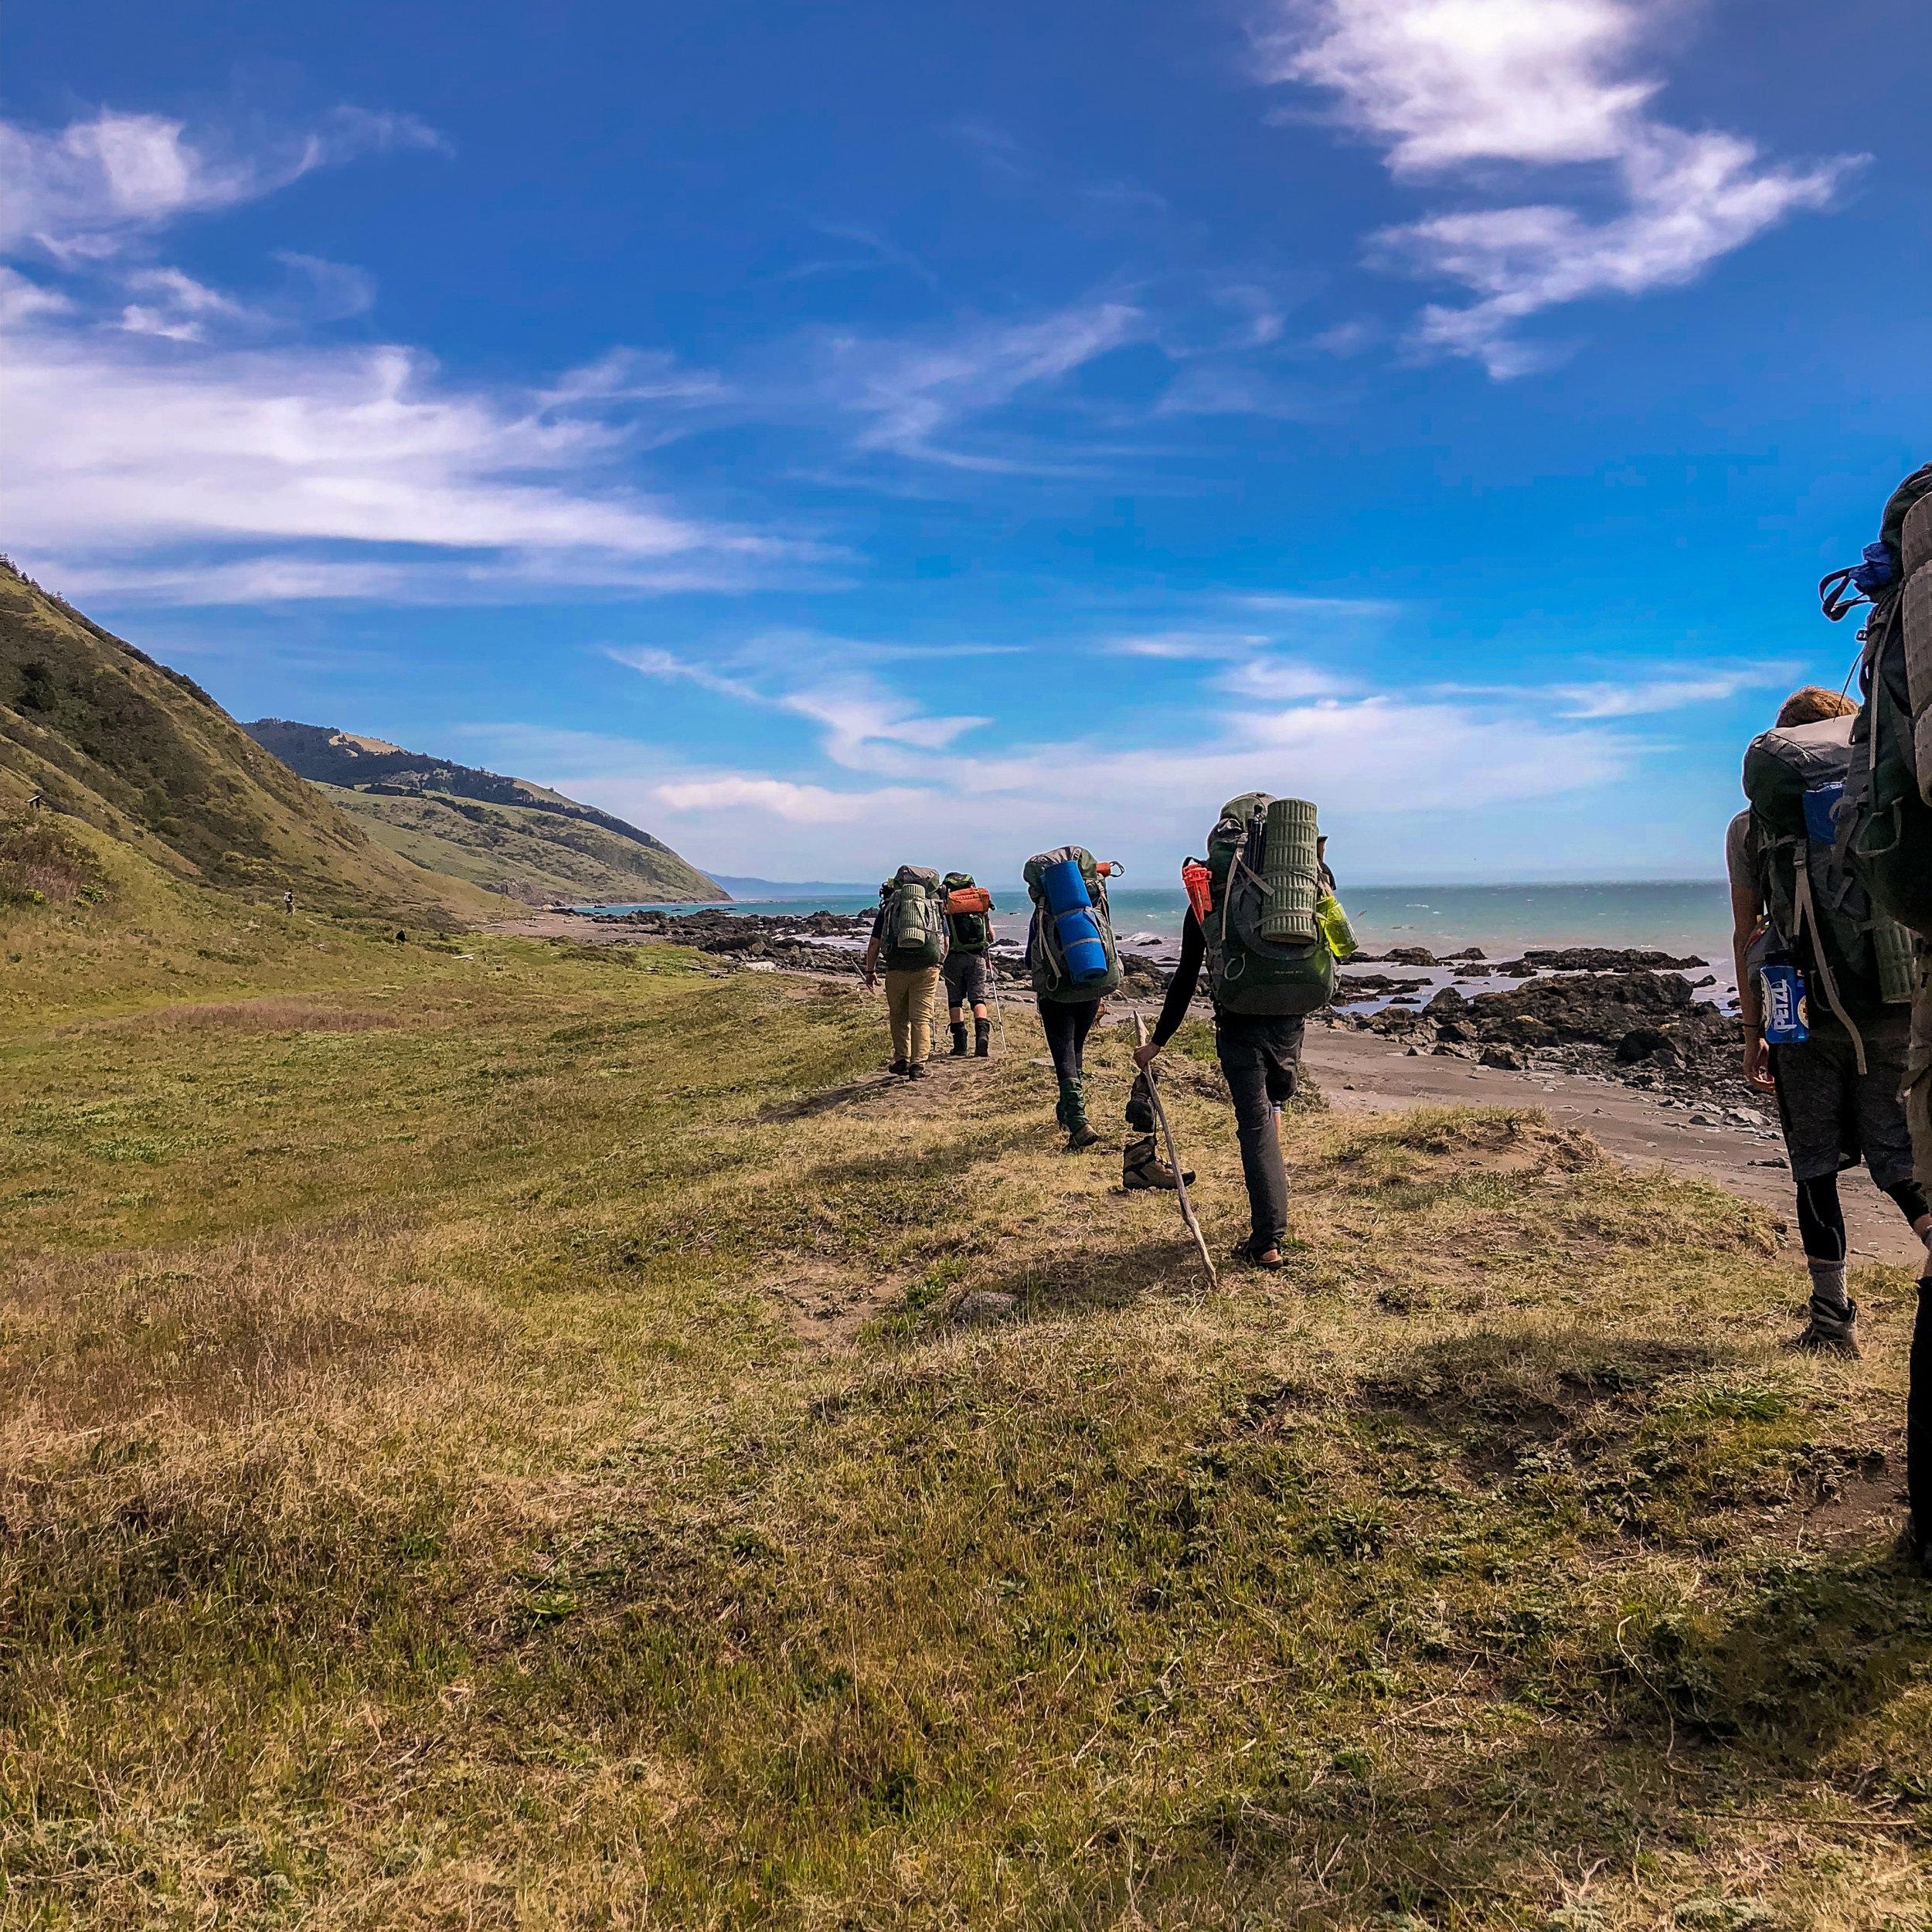 wilderness expedition - 10-21 Days